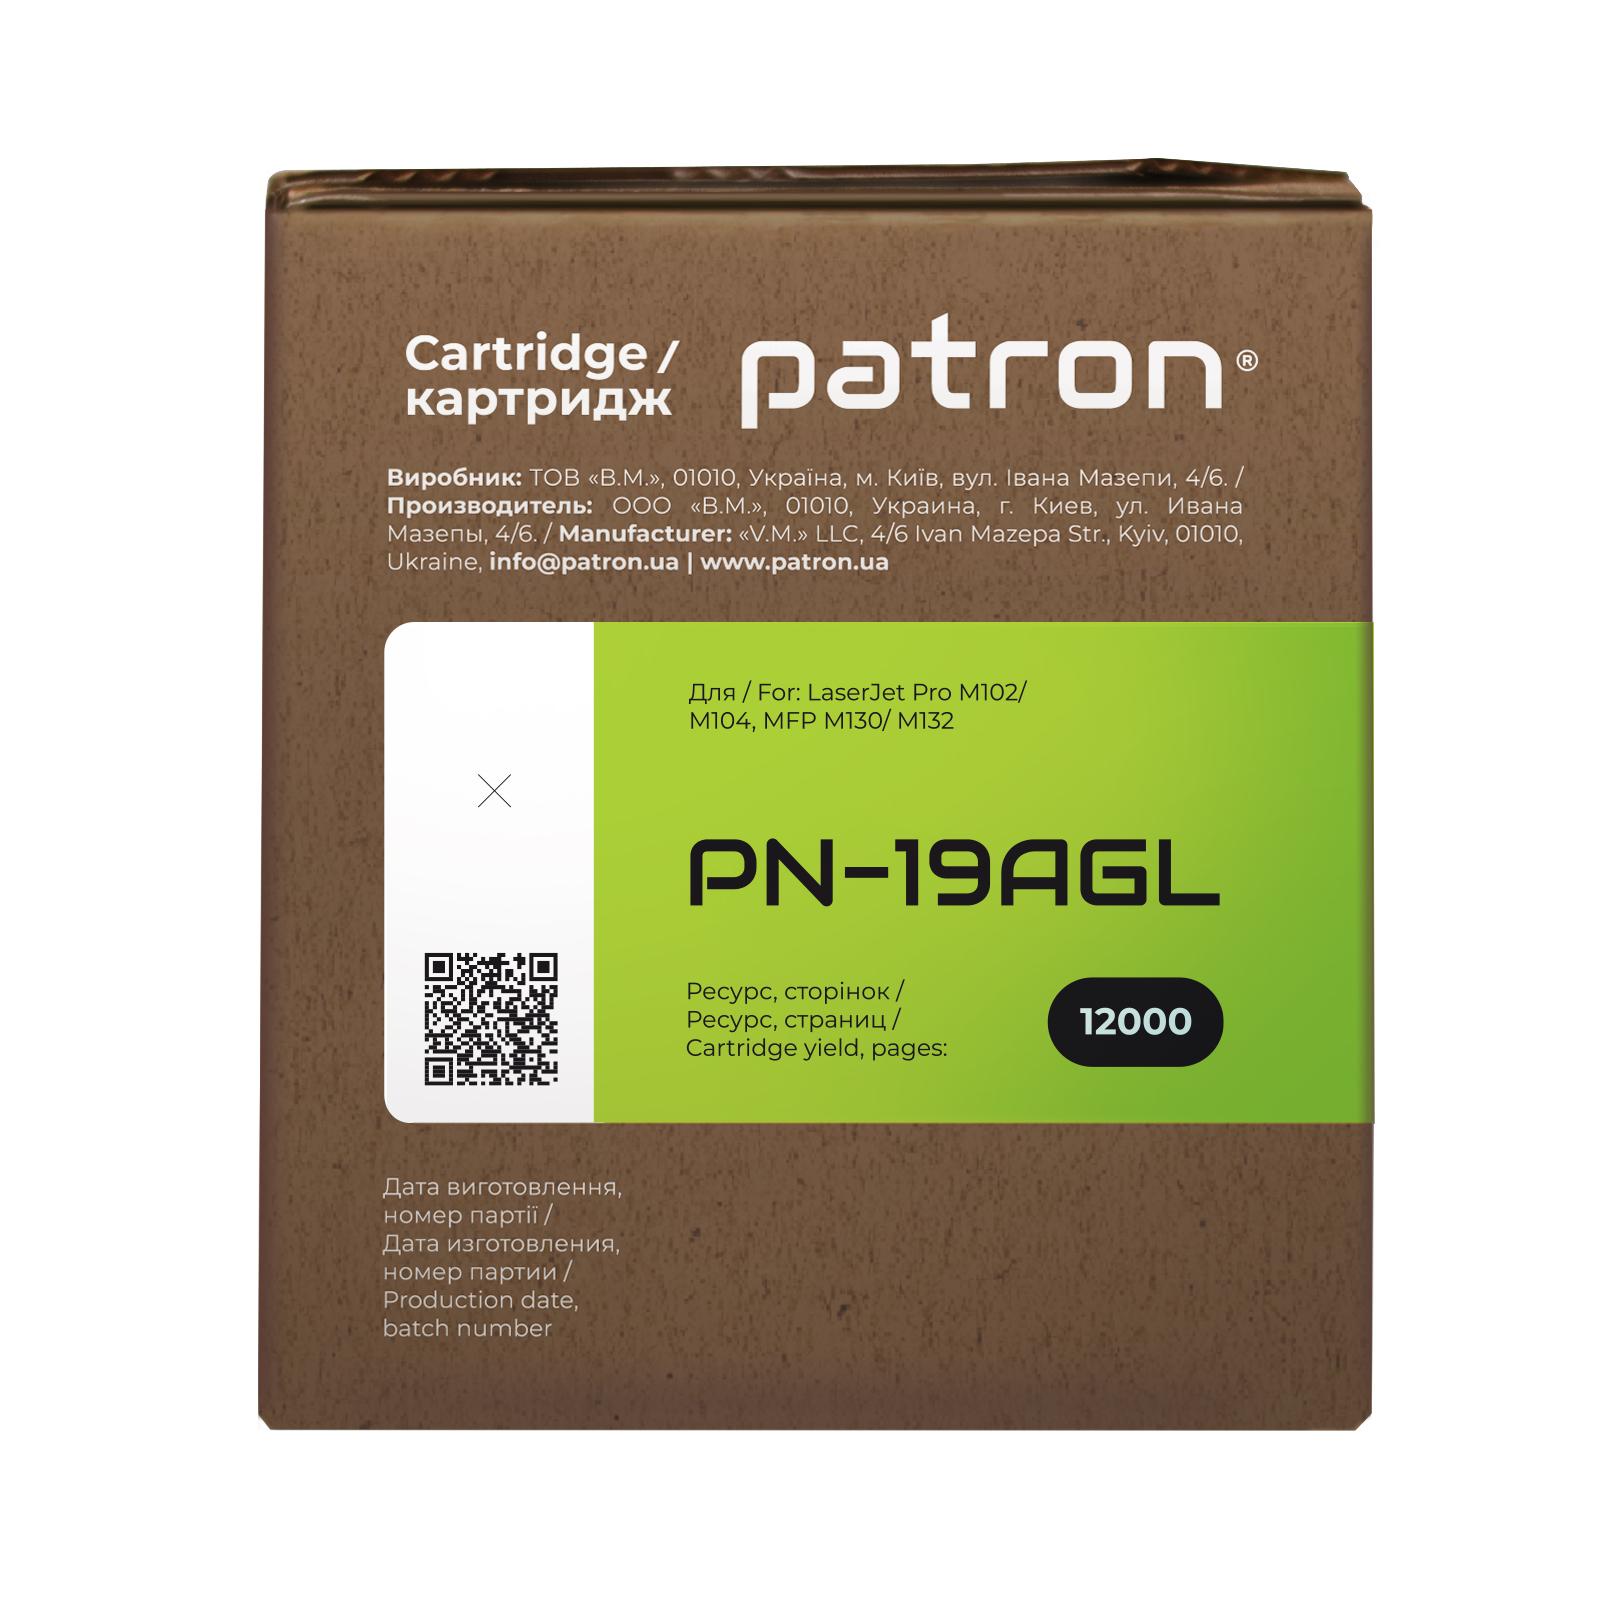 Драм картридж Patron HP LJ CF219A GREEN Label (PN-19AGL) изображение 3